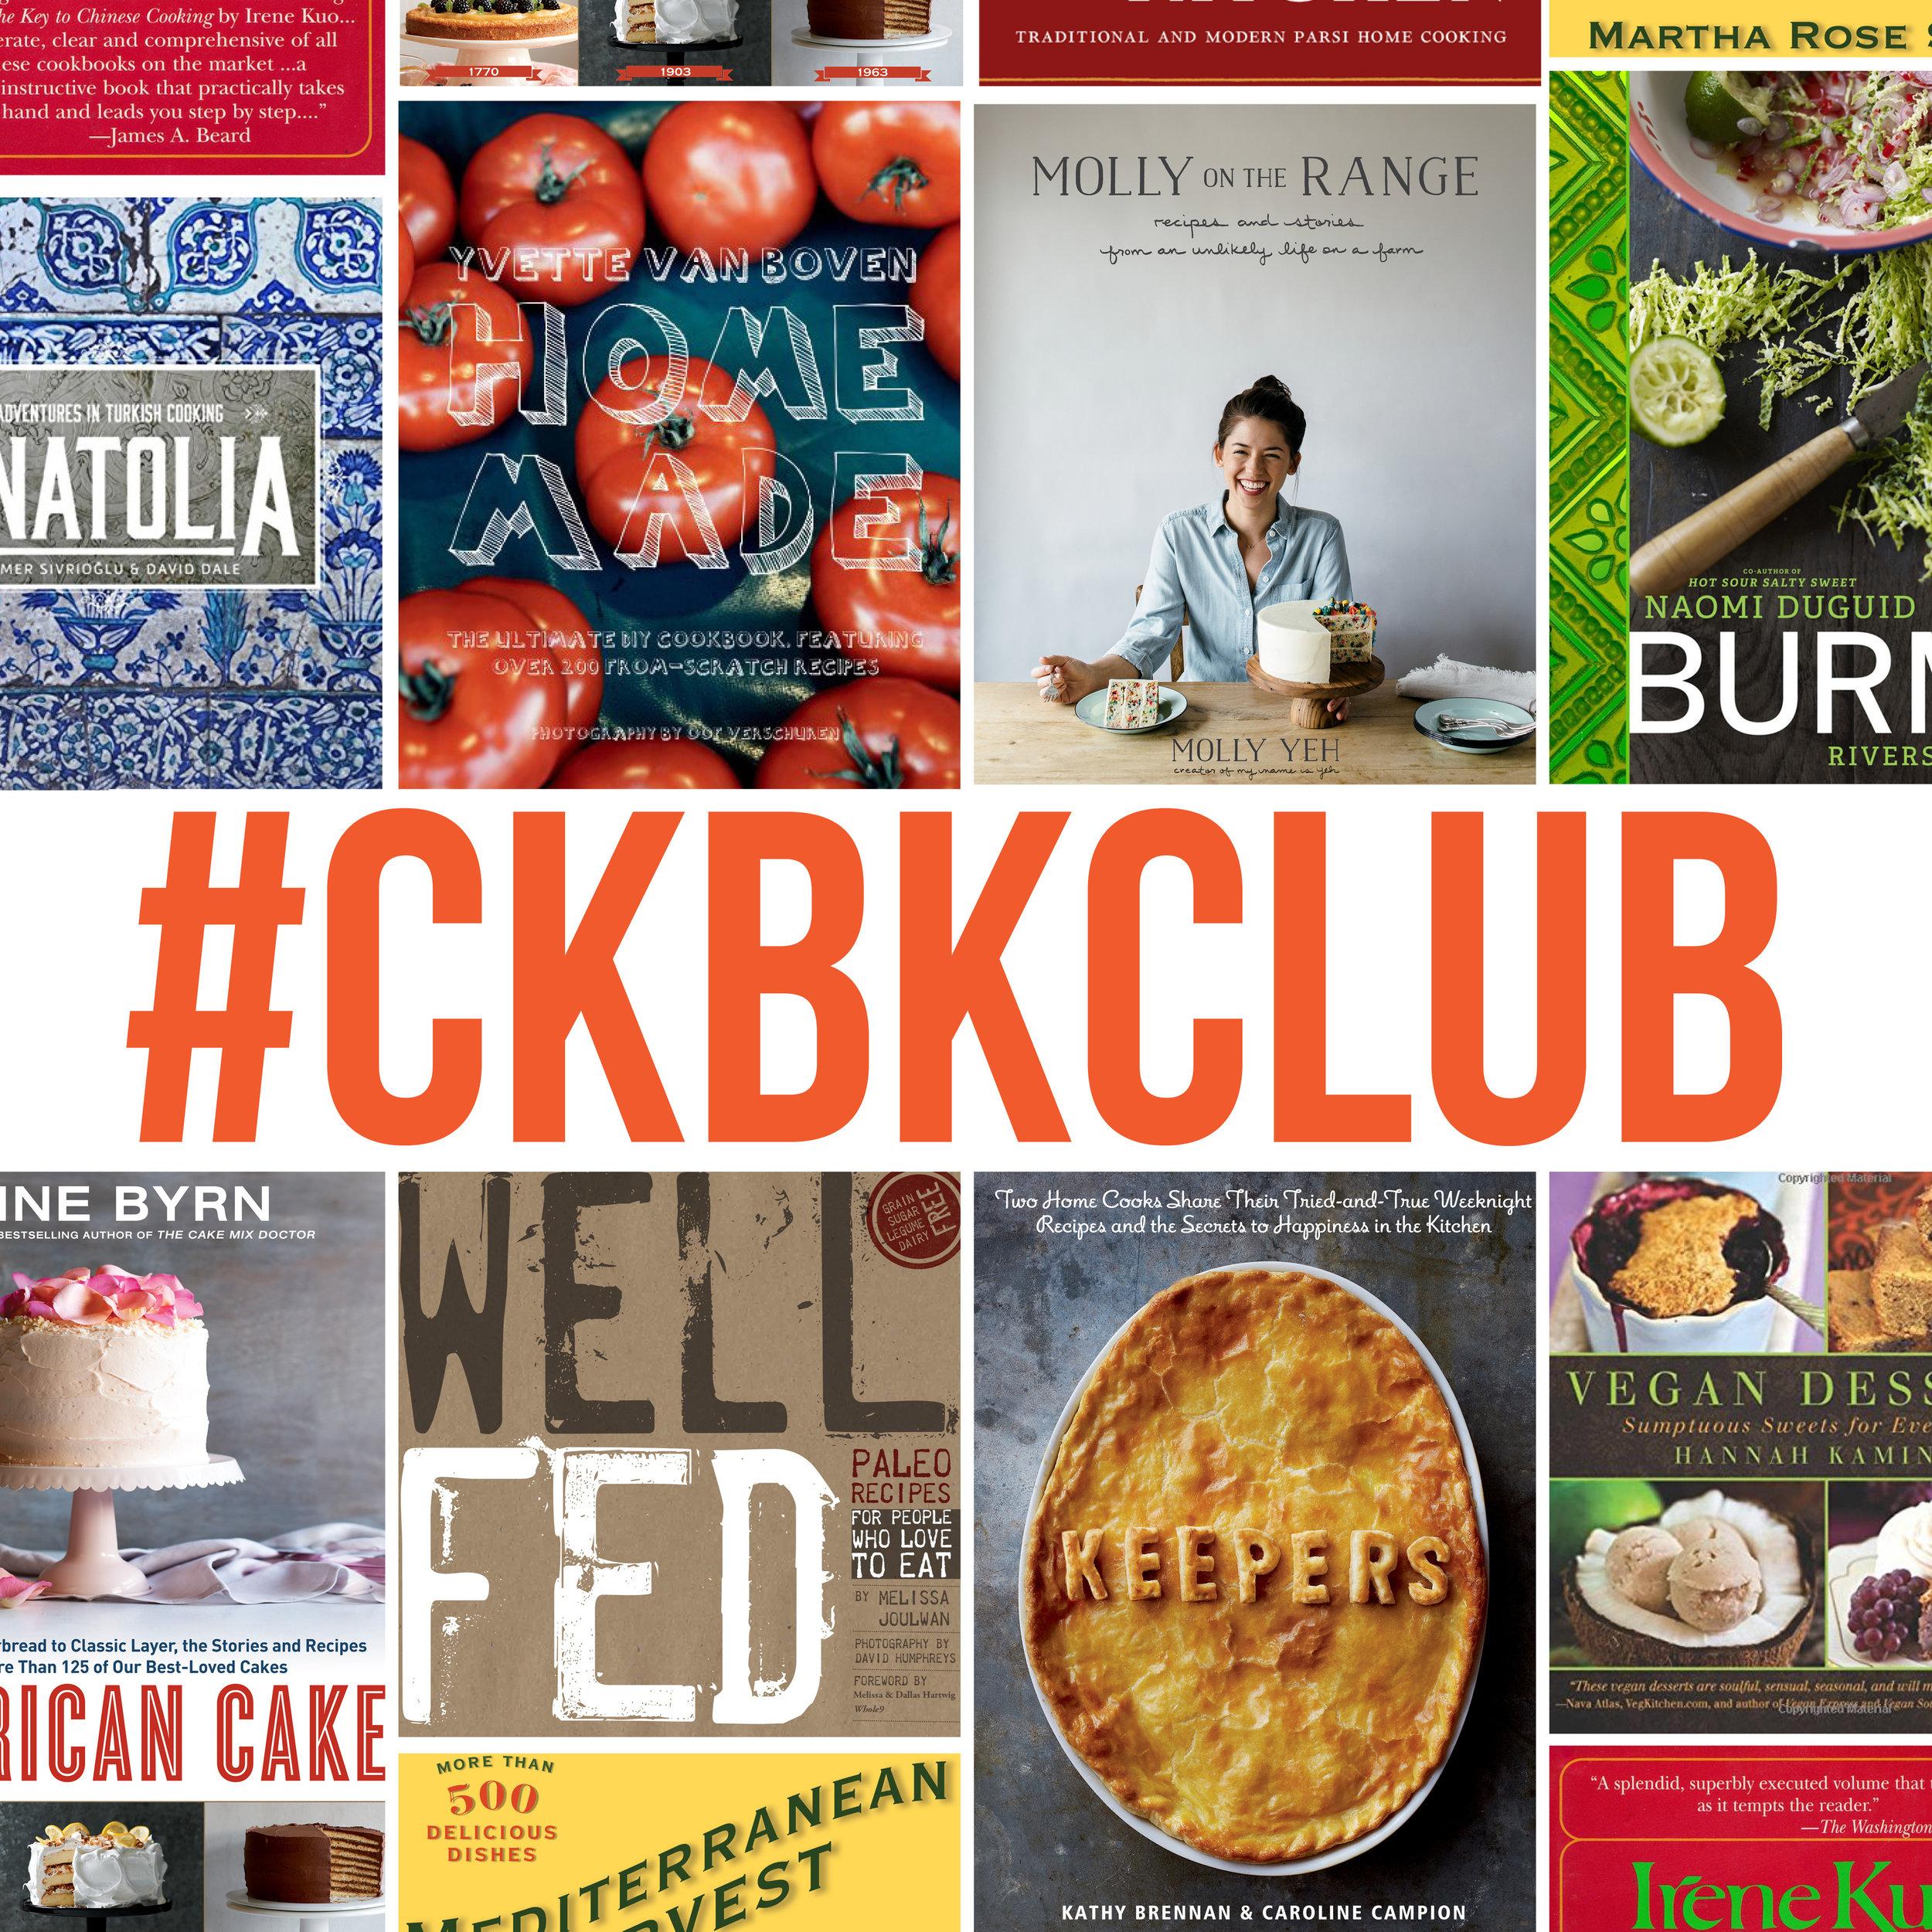 ckbkclub-image-ig.jpg